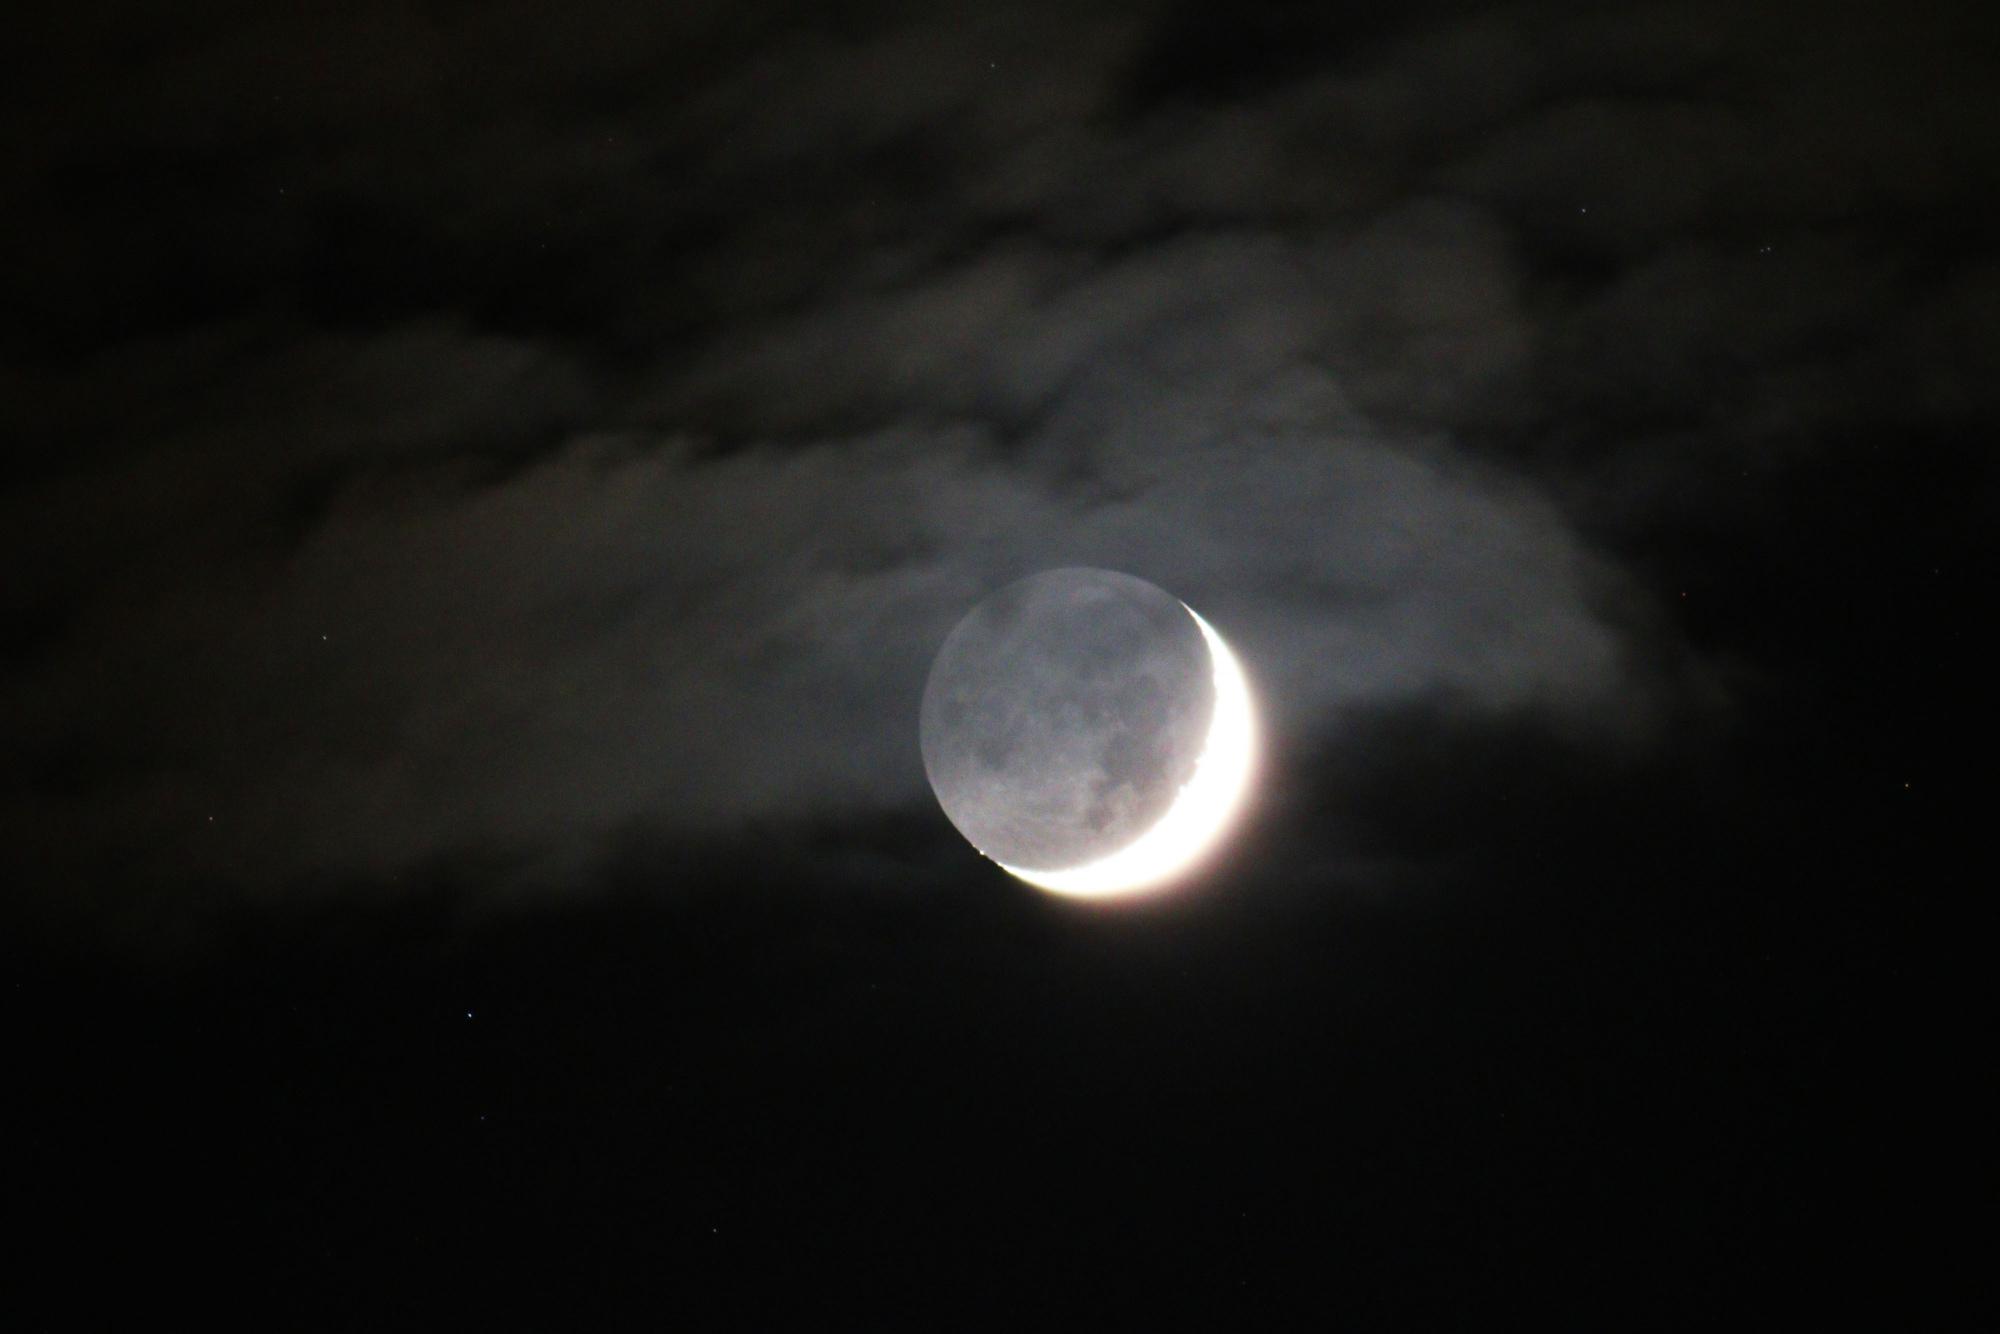 9 b Lune cendrée 5413B1N1 send.jpg